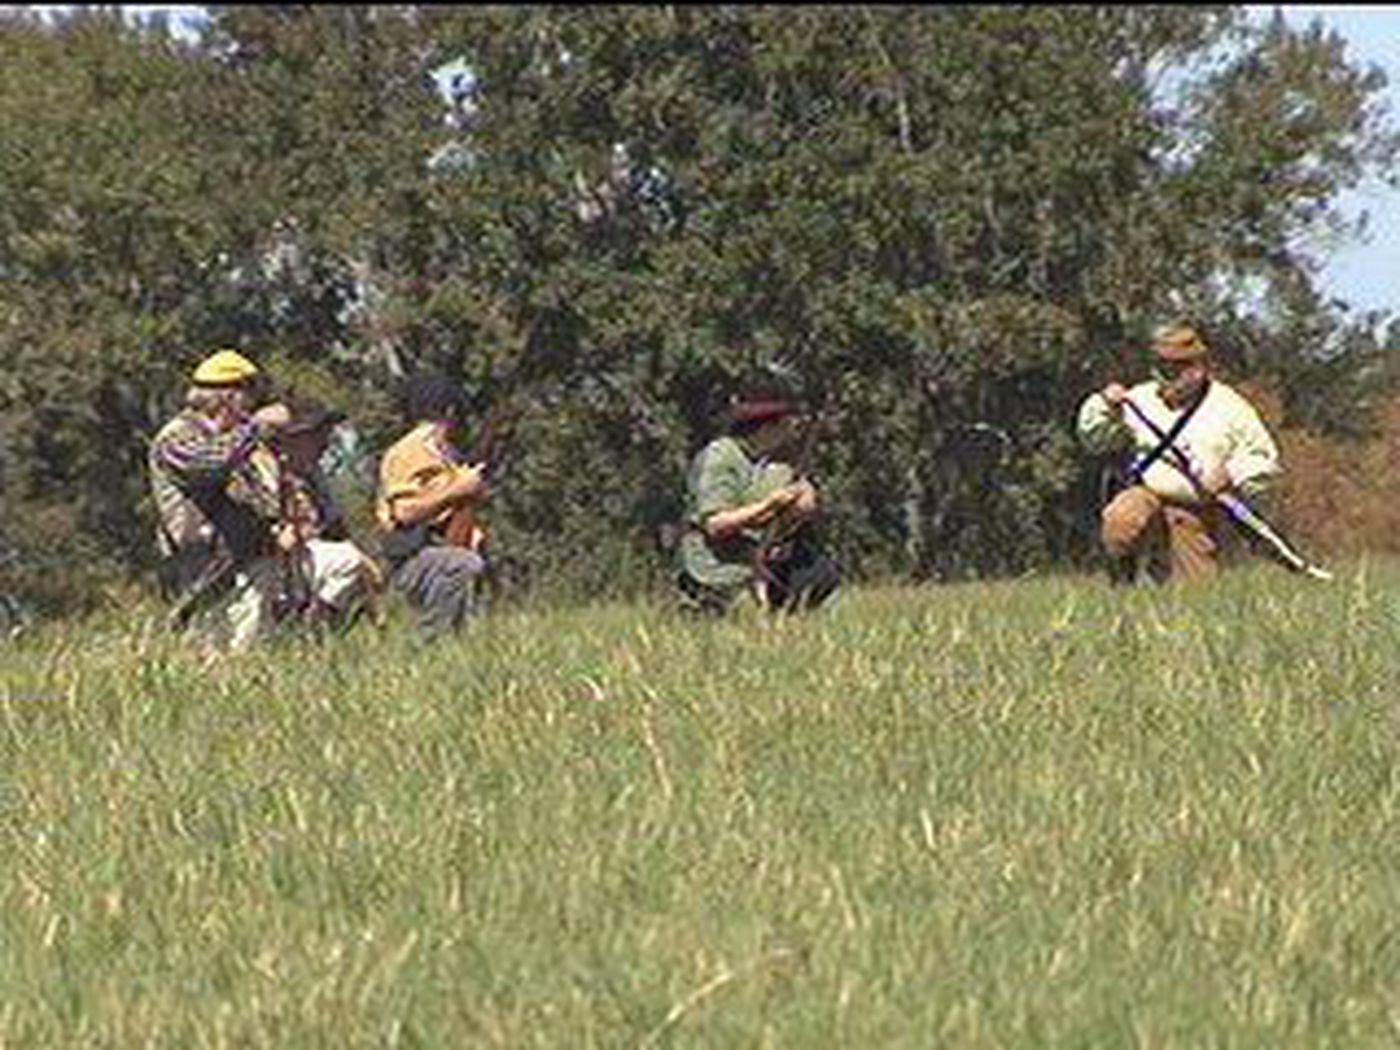 VIDEO: Camp Ford hosts Civil War reenactment